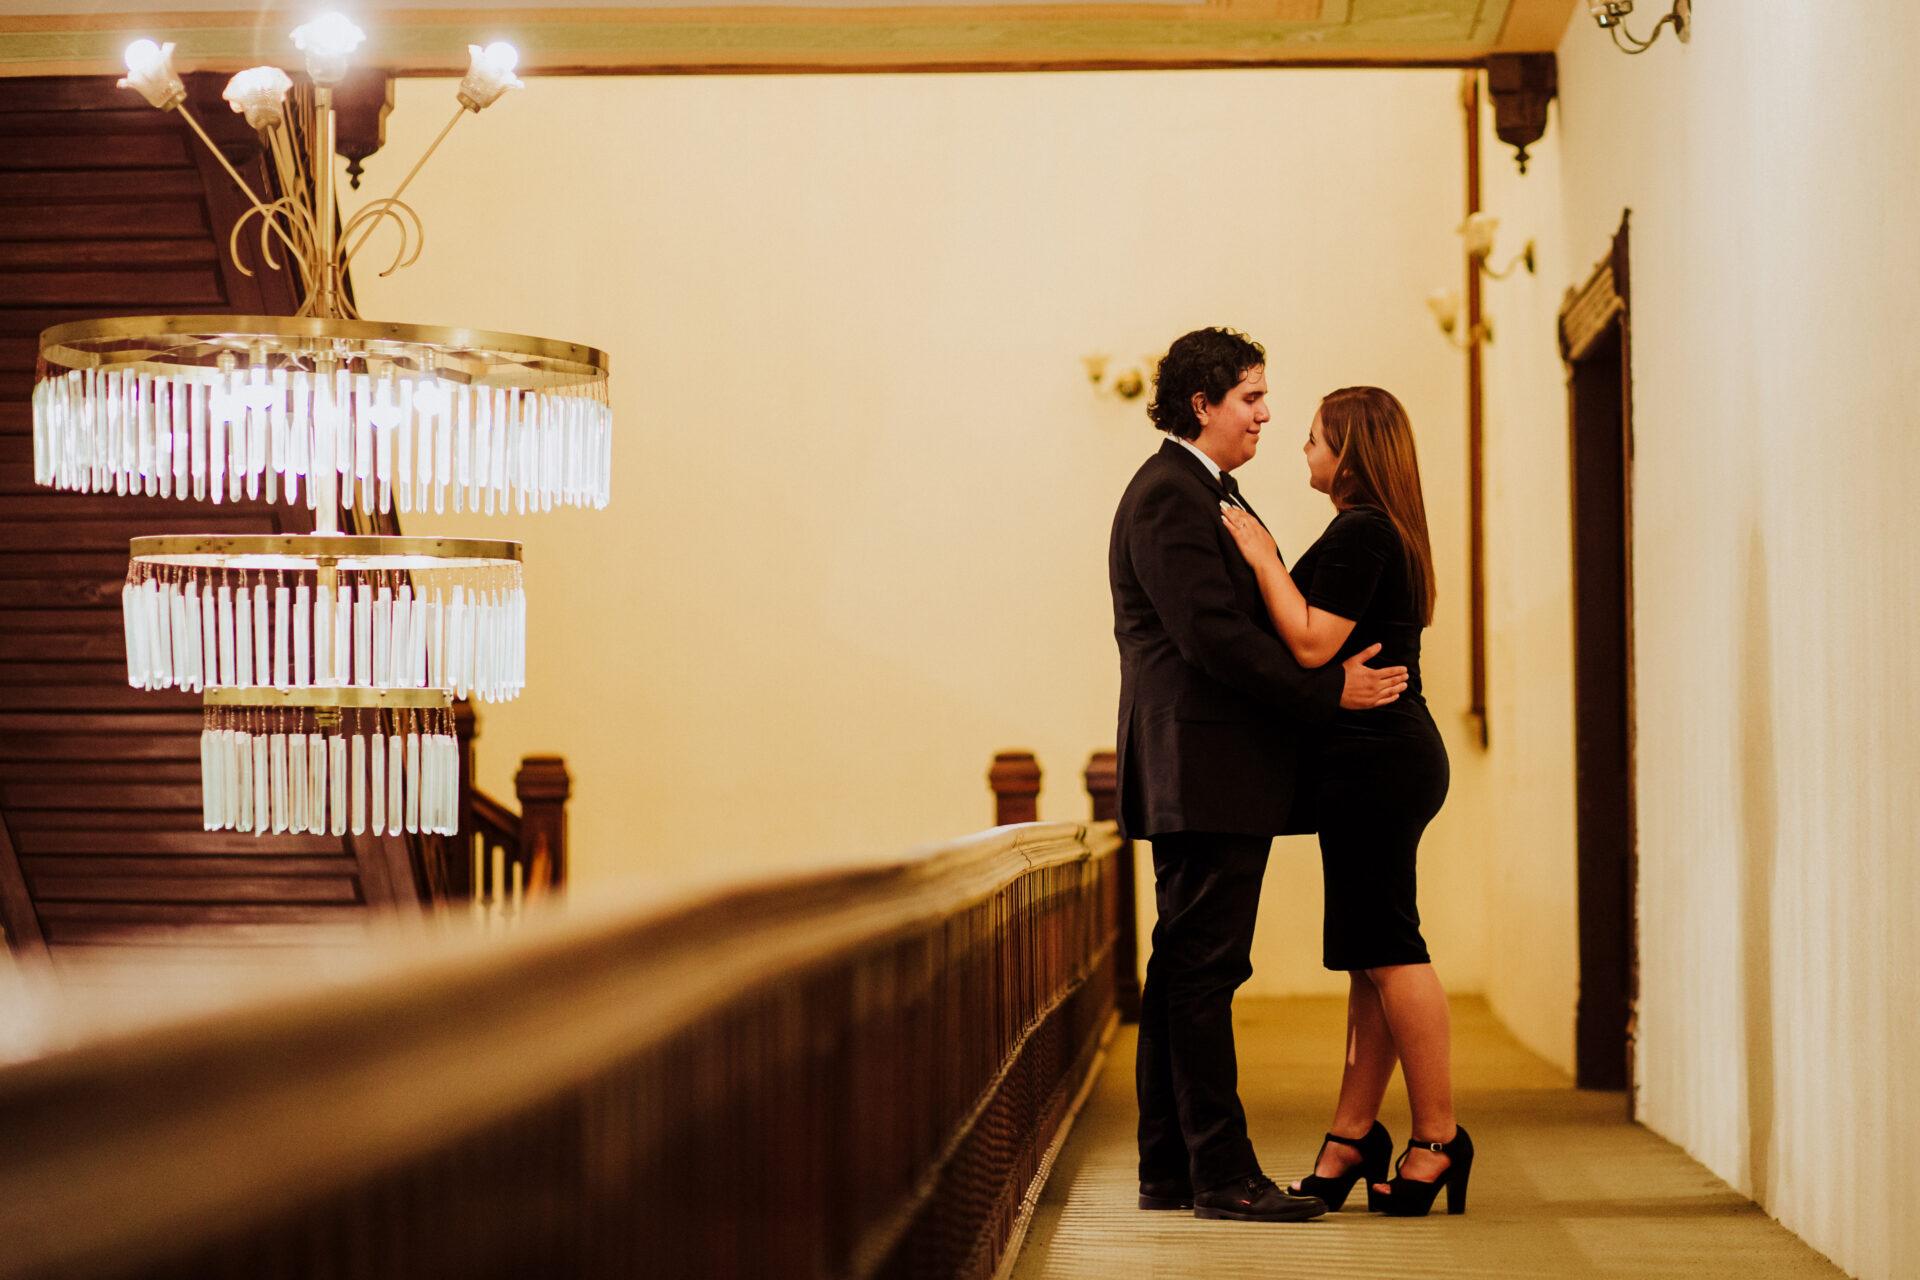 javier_noriega_fotografo_save_the_date_zacatecas_wedding_photographer13